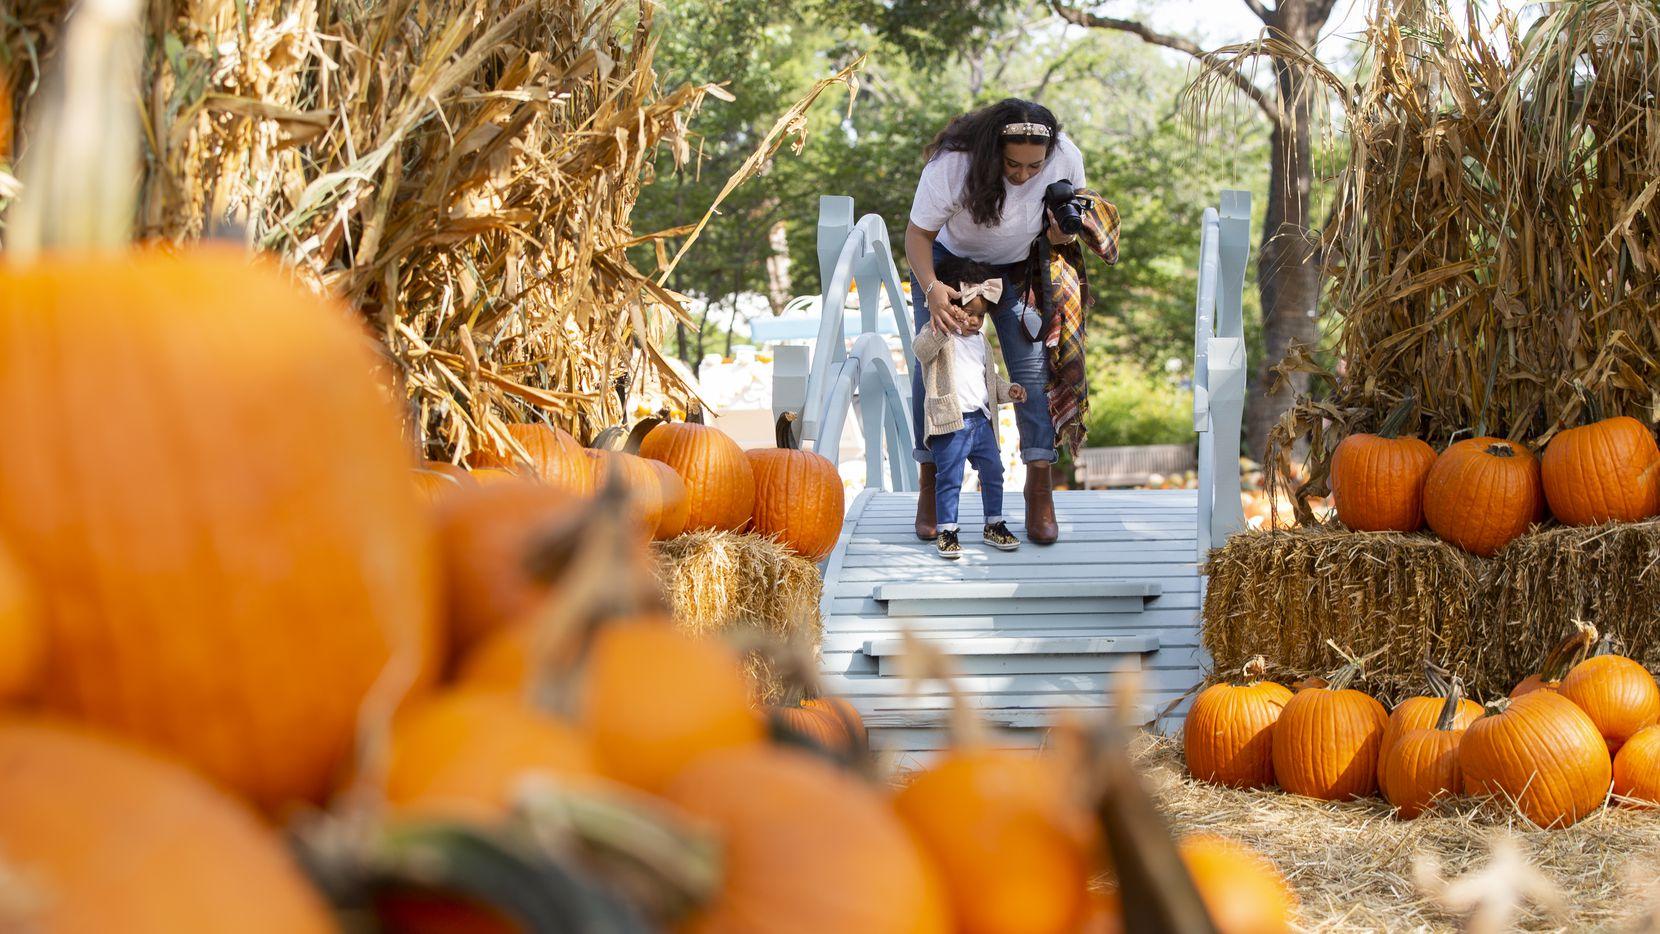 Julianna Baxter and Jordyn Simmons visit the Dallas Arboretum's Pumpkin Village in 2020. Autumn at the Arboretum starts Sept. 18, 2021.